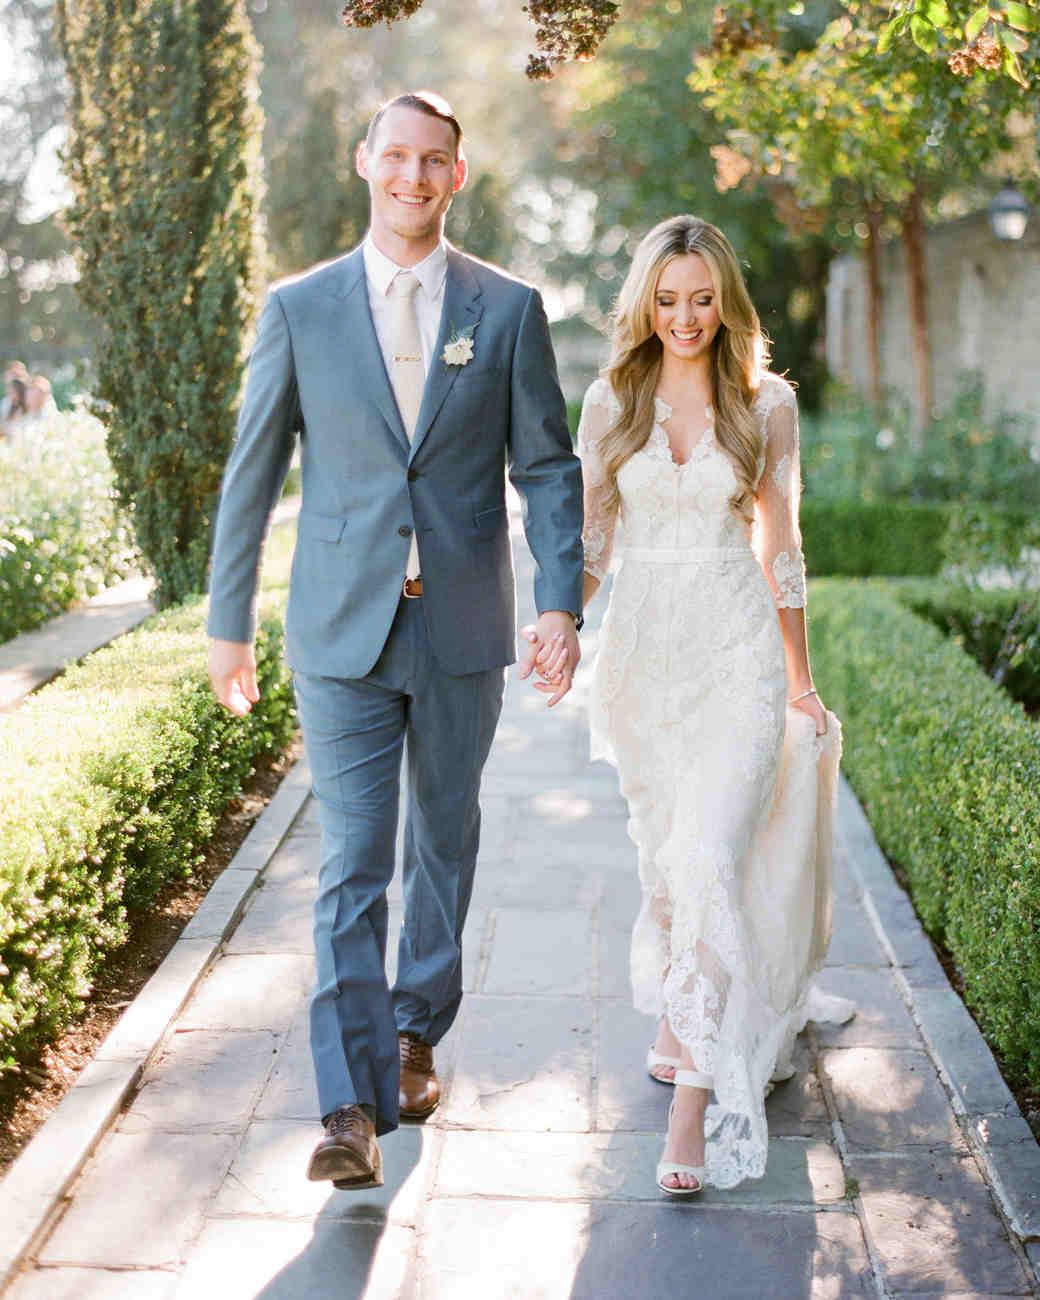 lily-jonathan-wedding-california-65830016-s112482.jpg